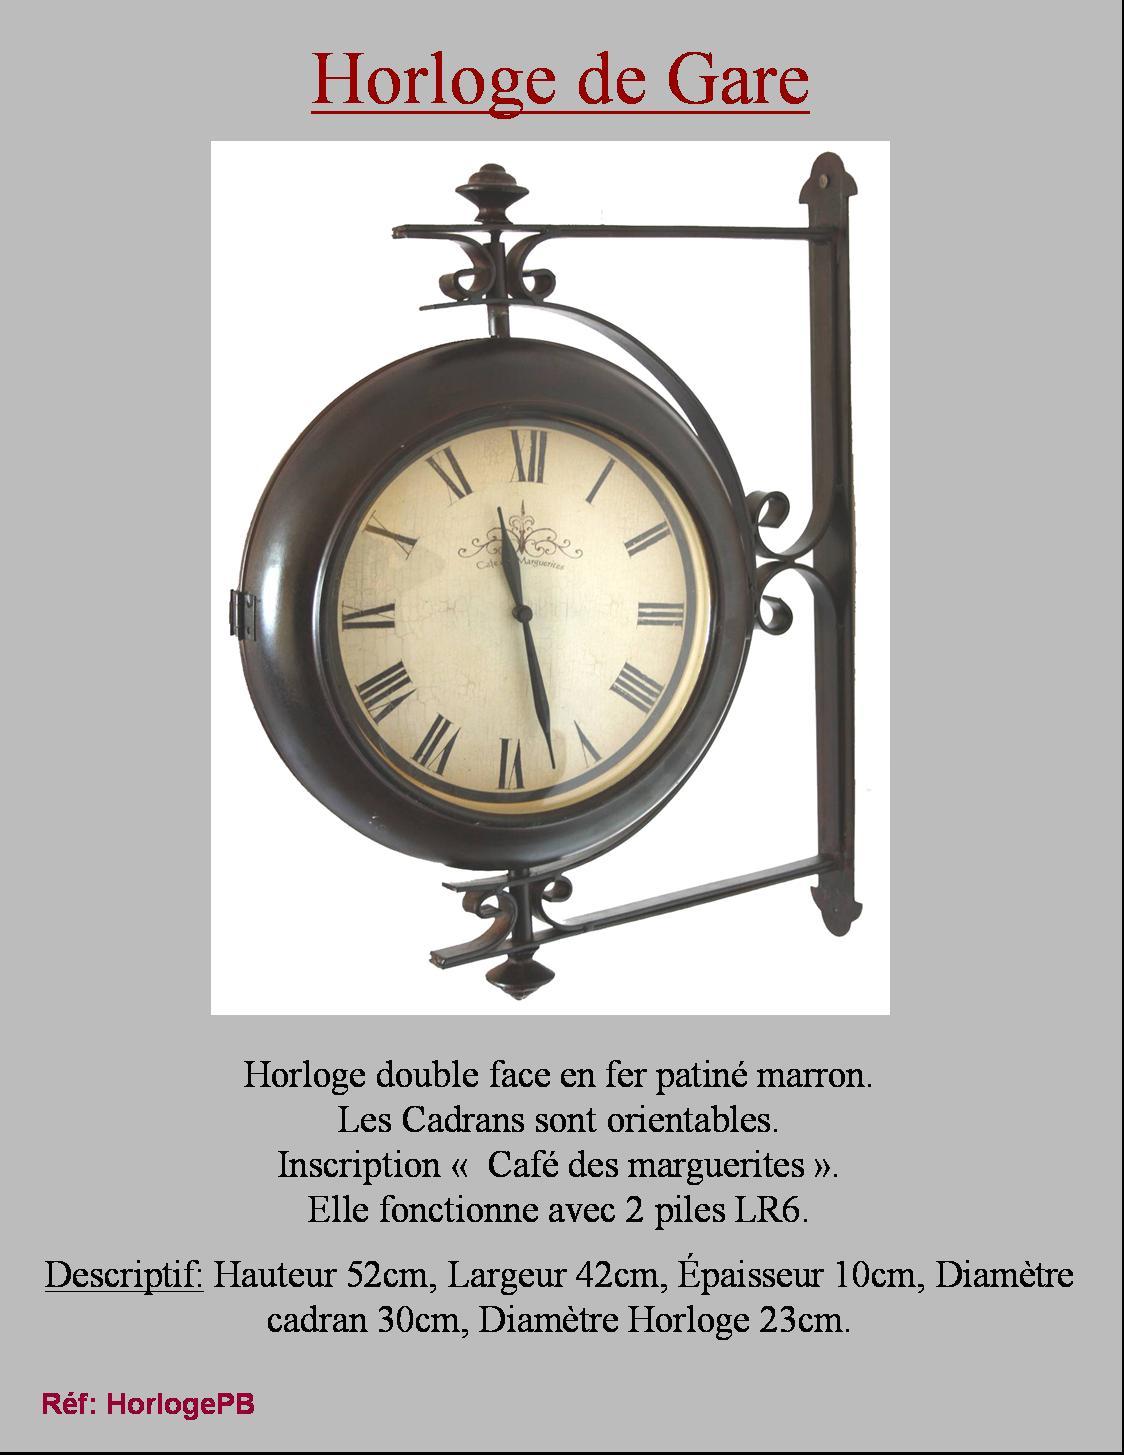 beautiful sur le vendeur grosse horloge murale ancienne with grande horloge murale ancienne. Black Bedroom Furniture Sets. Home Design Ideas